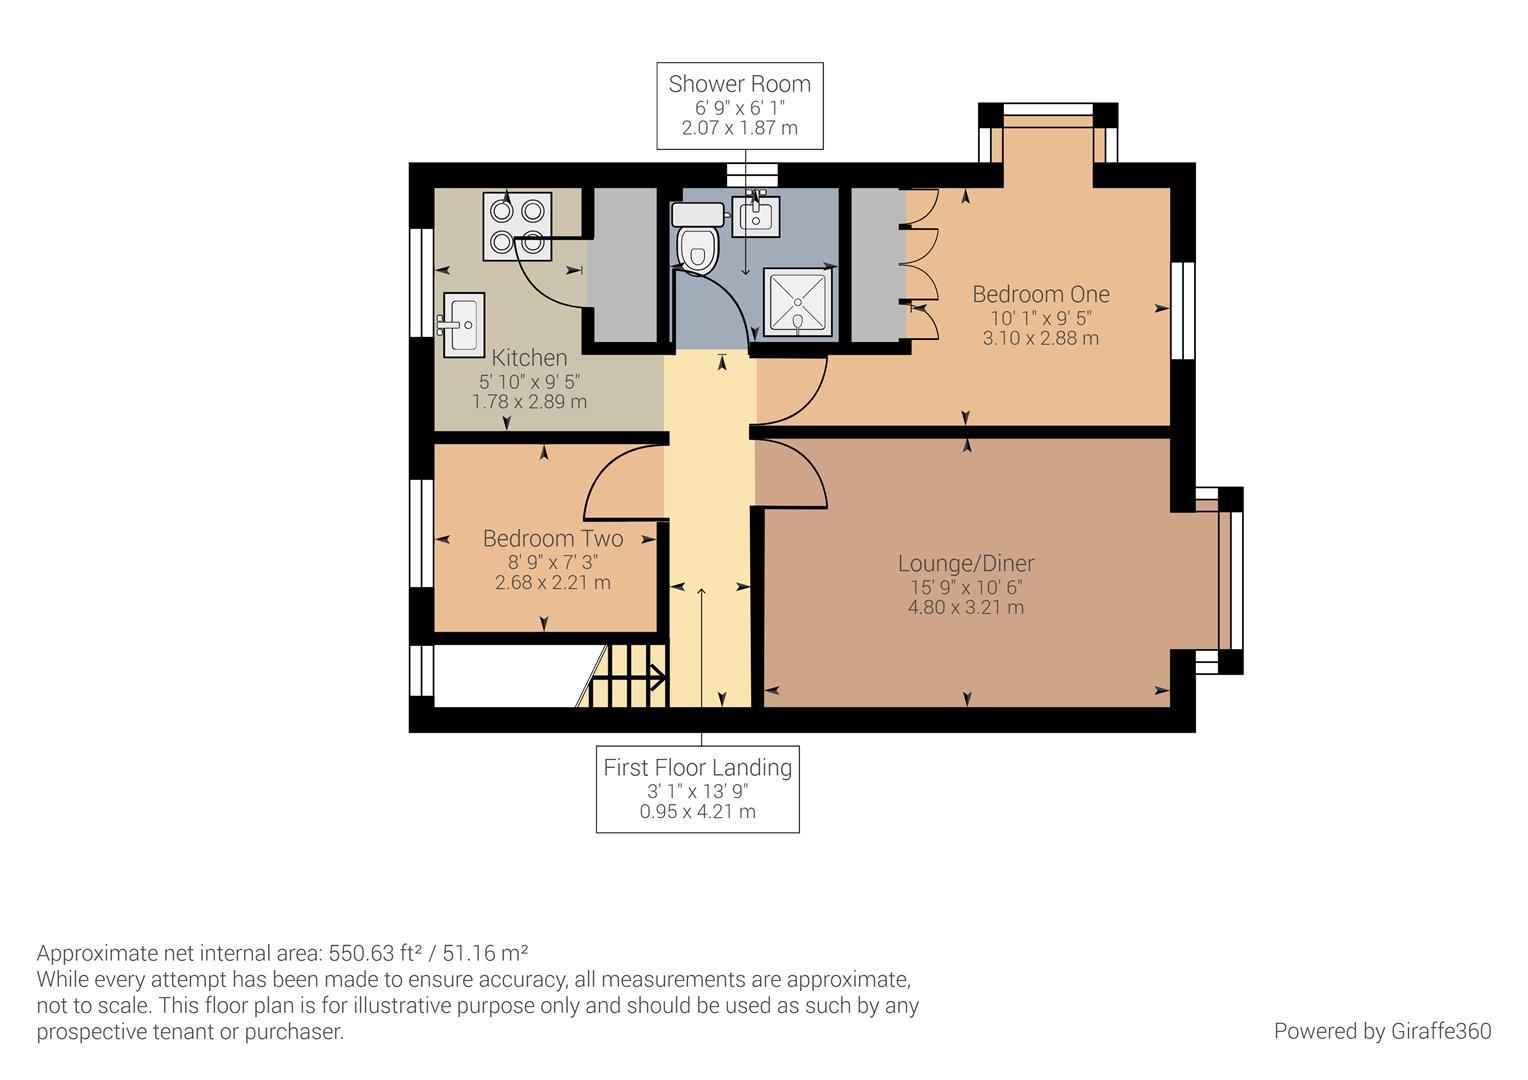 floorplan01_01.jpg